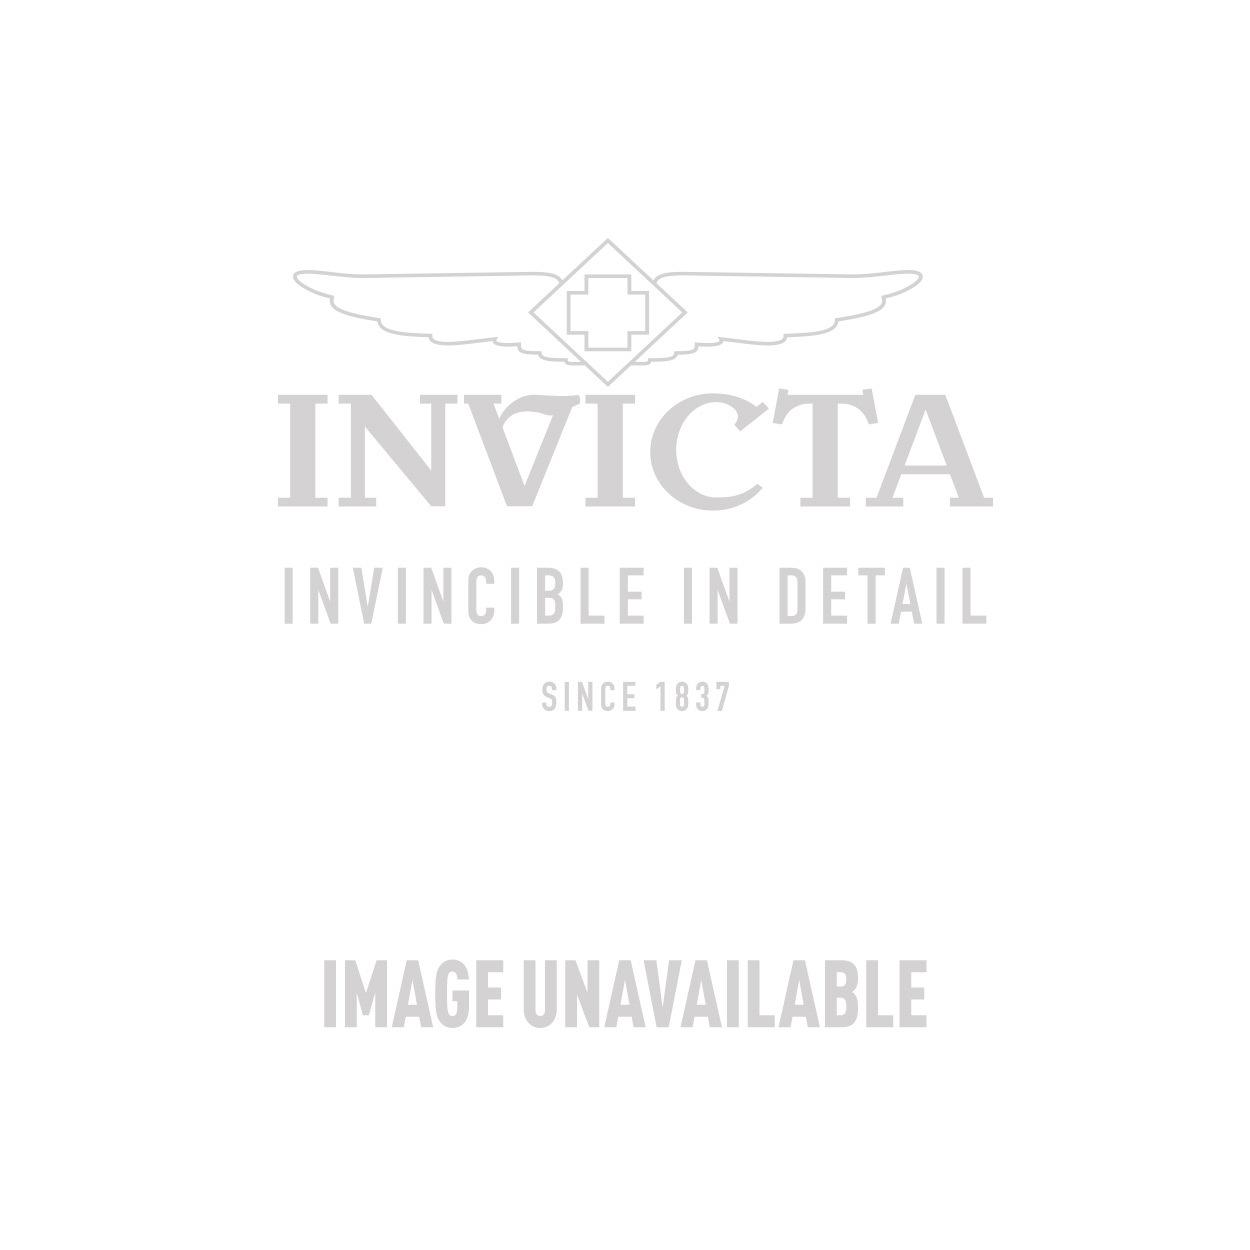 Invicta Sea Base Quartz Watch - Gold, Stainless Steel case with Steel, Gold tone Stainless Steel band - Model 20392